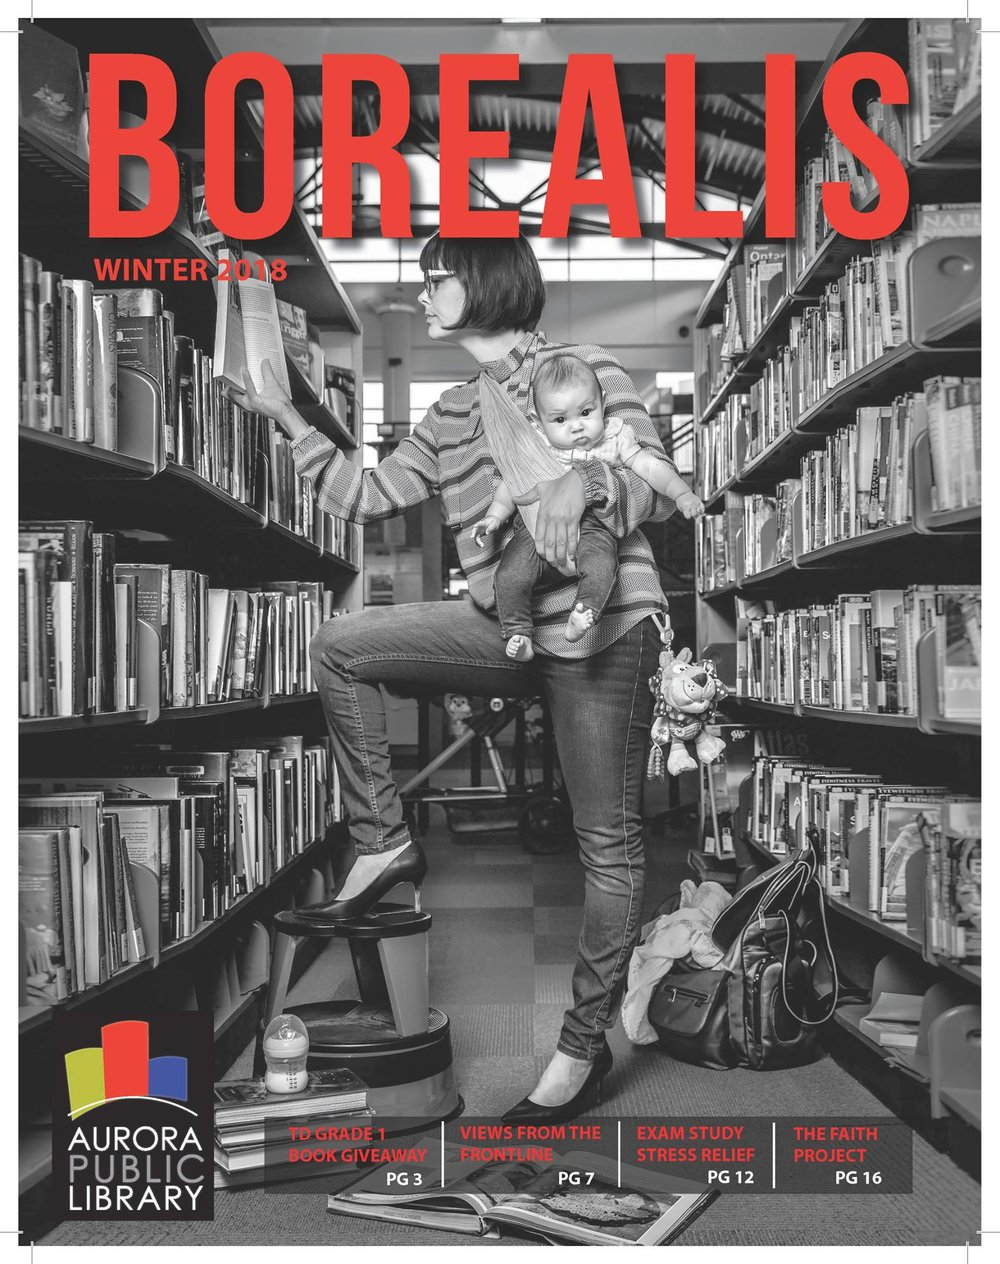 BOREALIS Cover.jpg